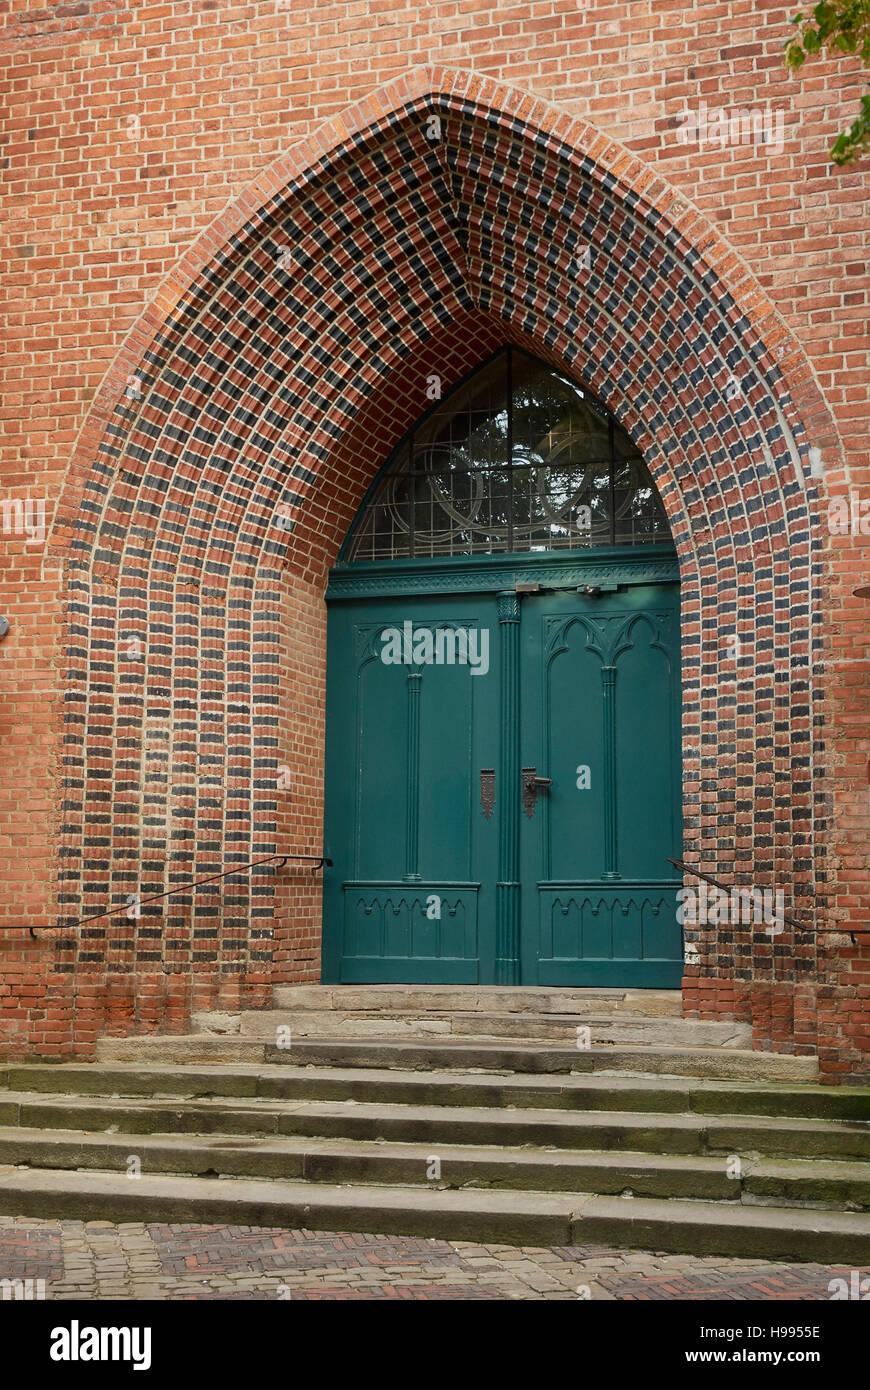 Gothic brick architecture, Church of John the Baptist, Lüneburg, Germany - Stock Image